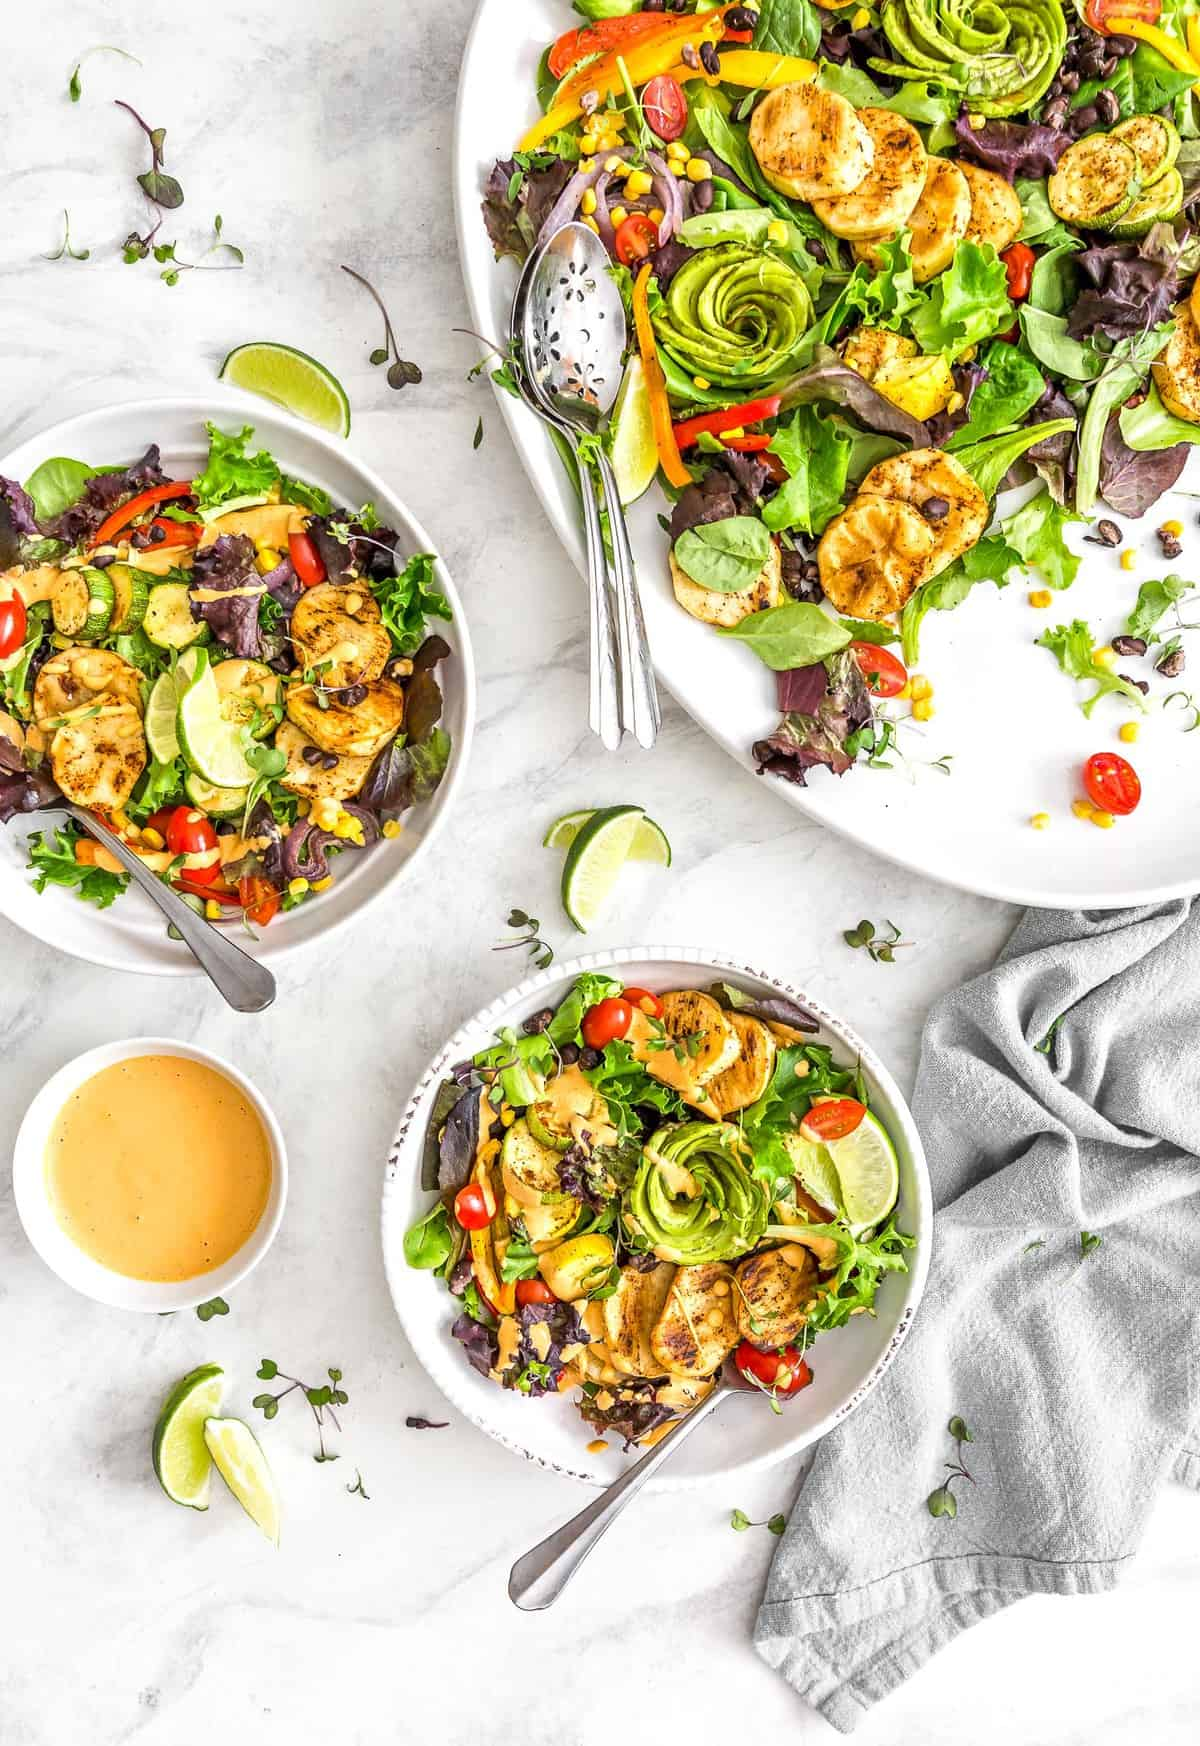 Southwestern Roasted Veggie Salad, Vegan salad, roasted veggie salad, vegan roasted veggie, roasted veggies, salad, plant based salad, plant based, vegan, vegetarian, whole food plant based, gluten free, recipe, wfpb, healthy, healthy vegan, oil free, no refined sugar, no oil, refined sugar free, dairy free, dairy, dinner, lunch, healthy recipe, southwestern recipe